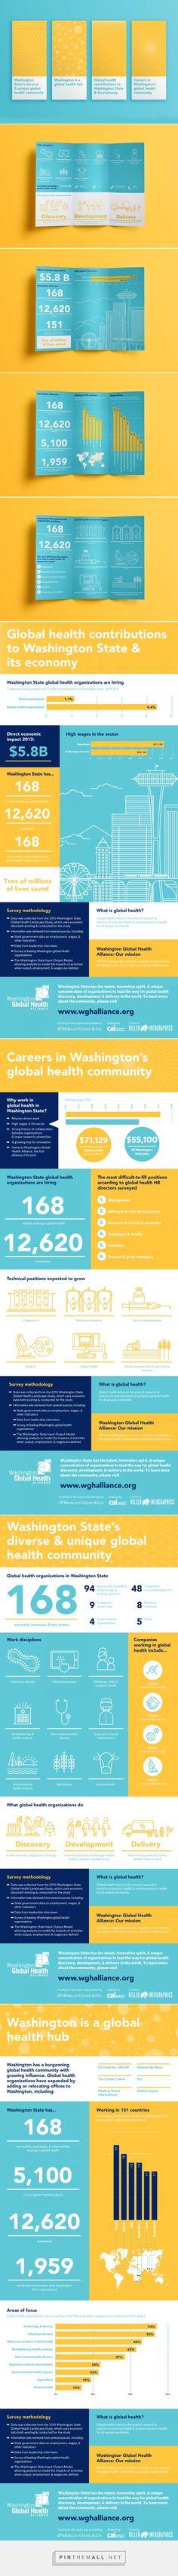 MULTIMEDIA: WASHINGTON GLOBAL HEALTH LANDSCAPE STUDY - Killer Infographics - created via https://pinthemall.net